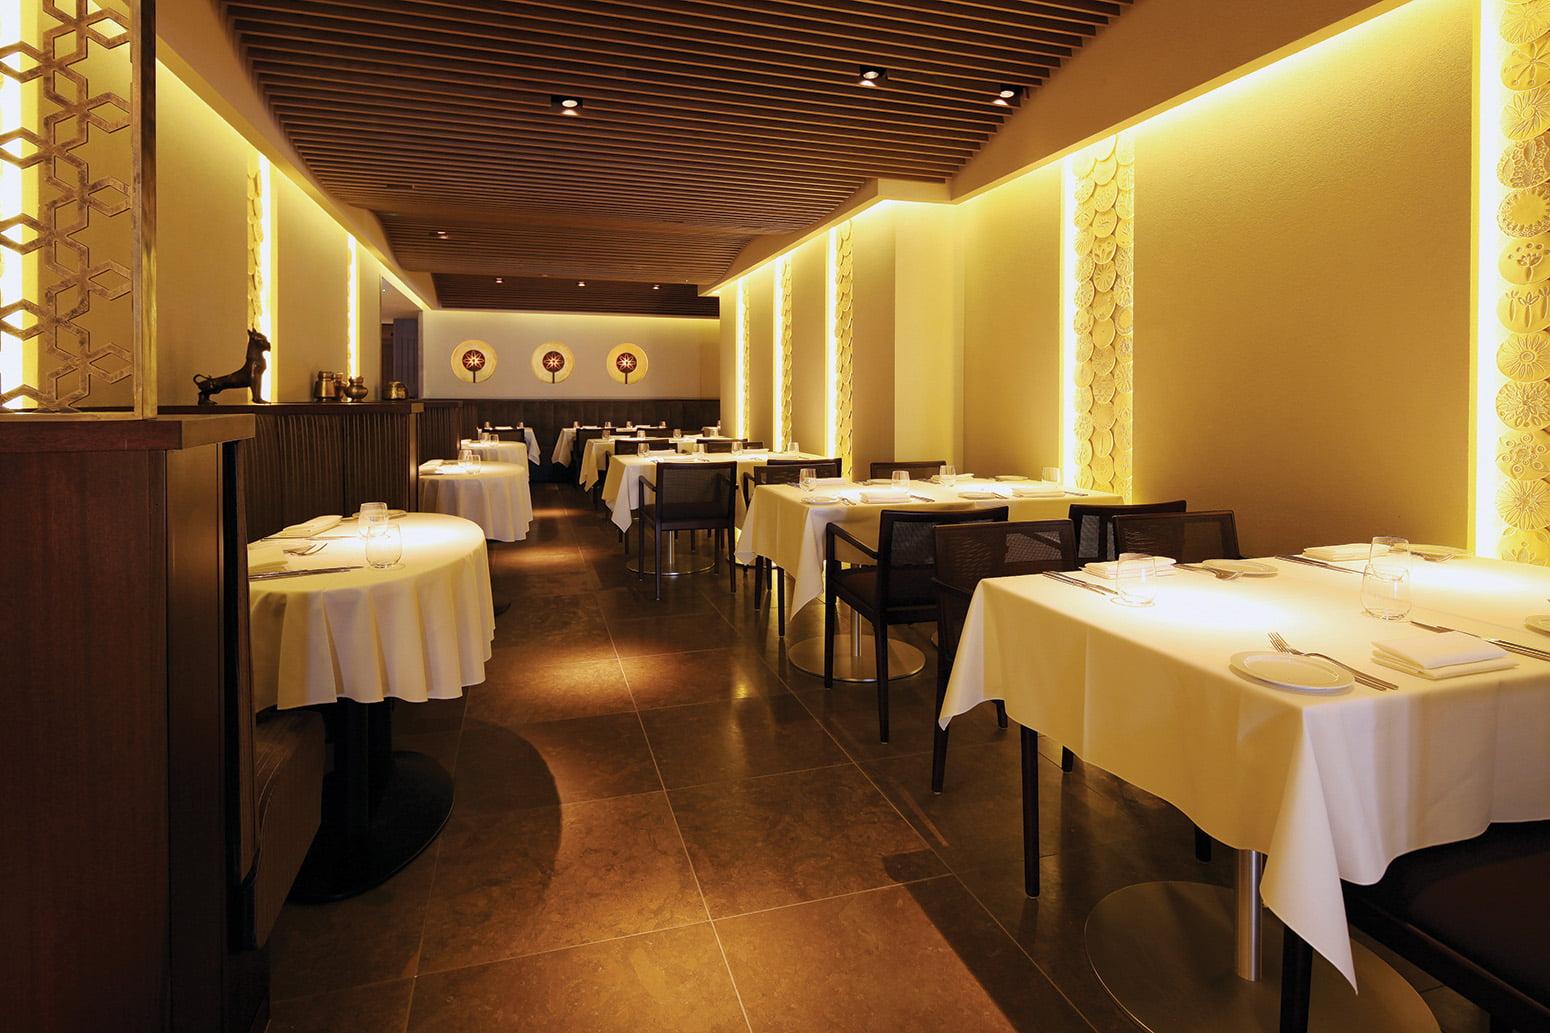 quilon michelin star restaurants london